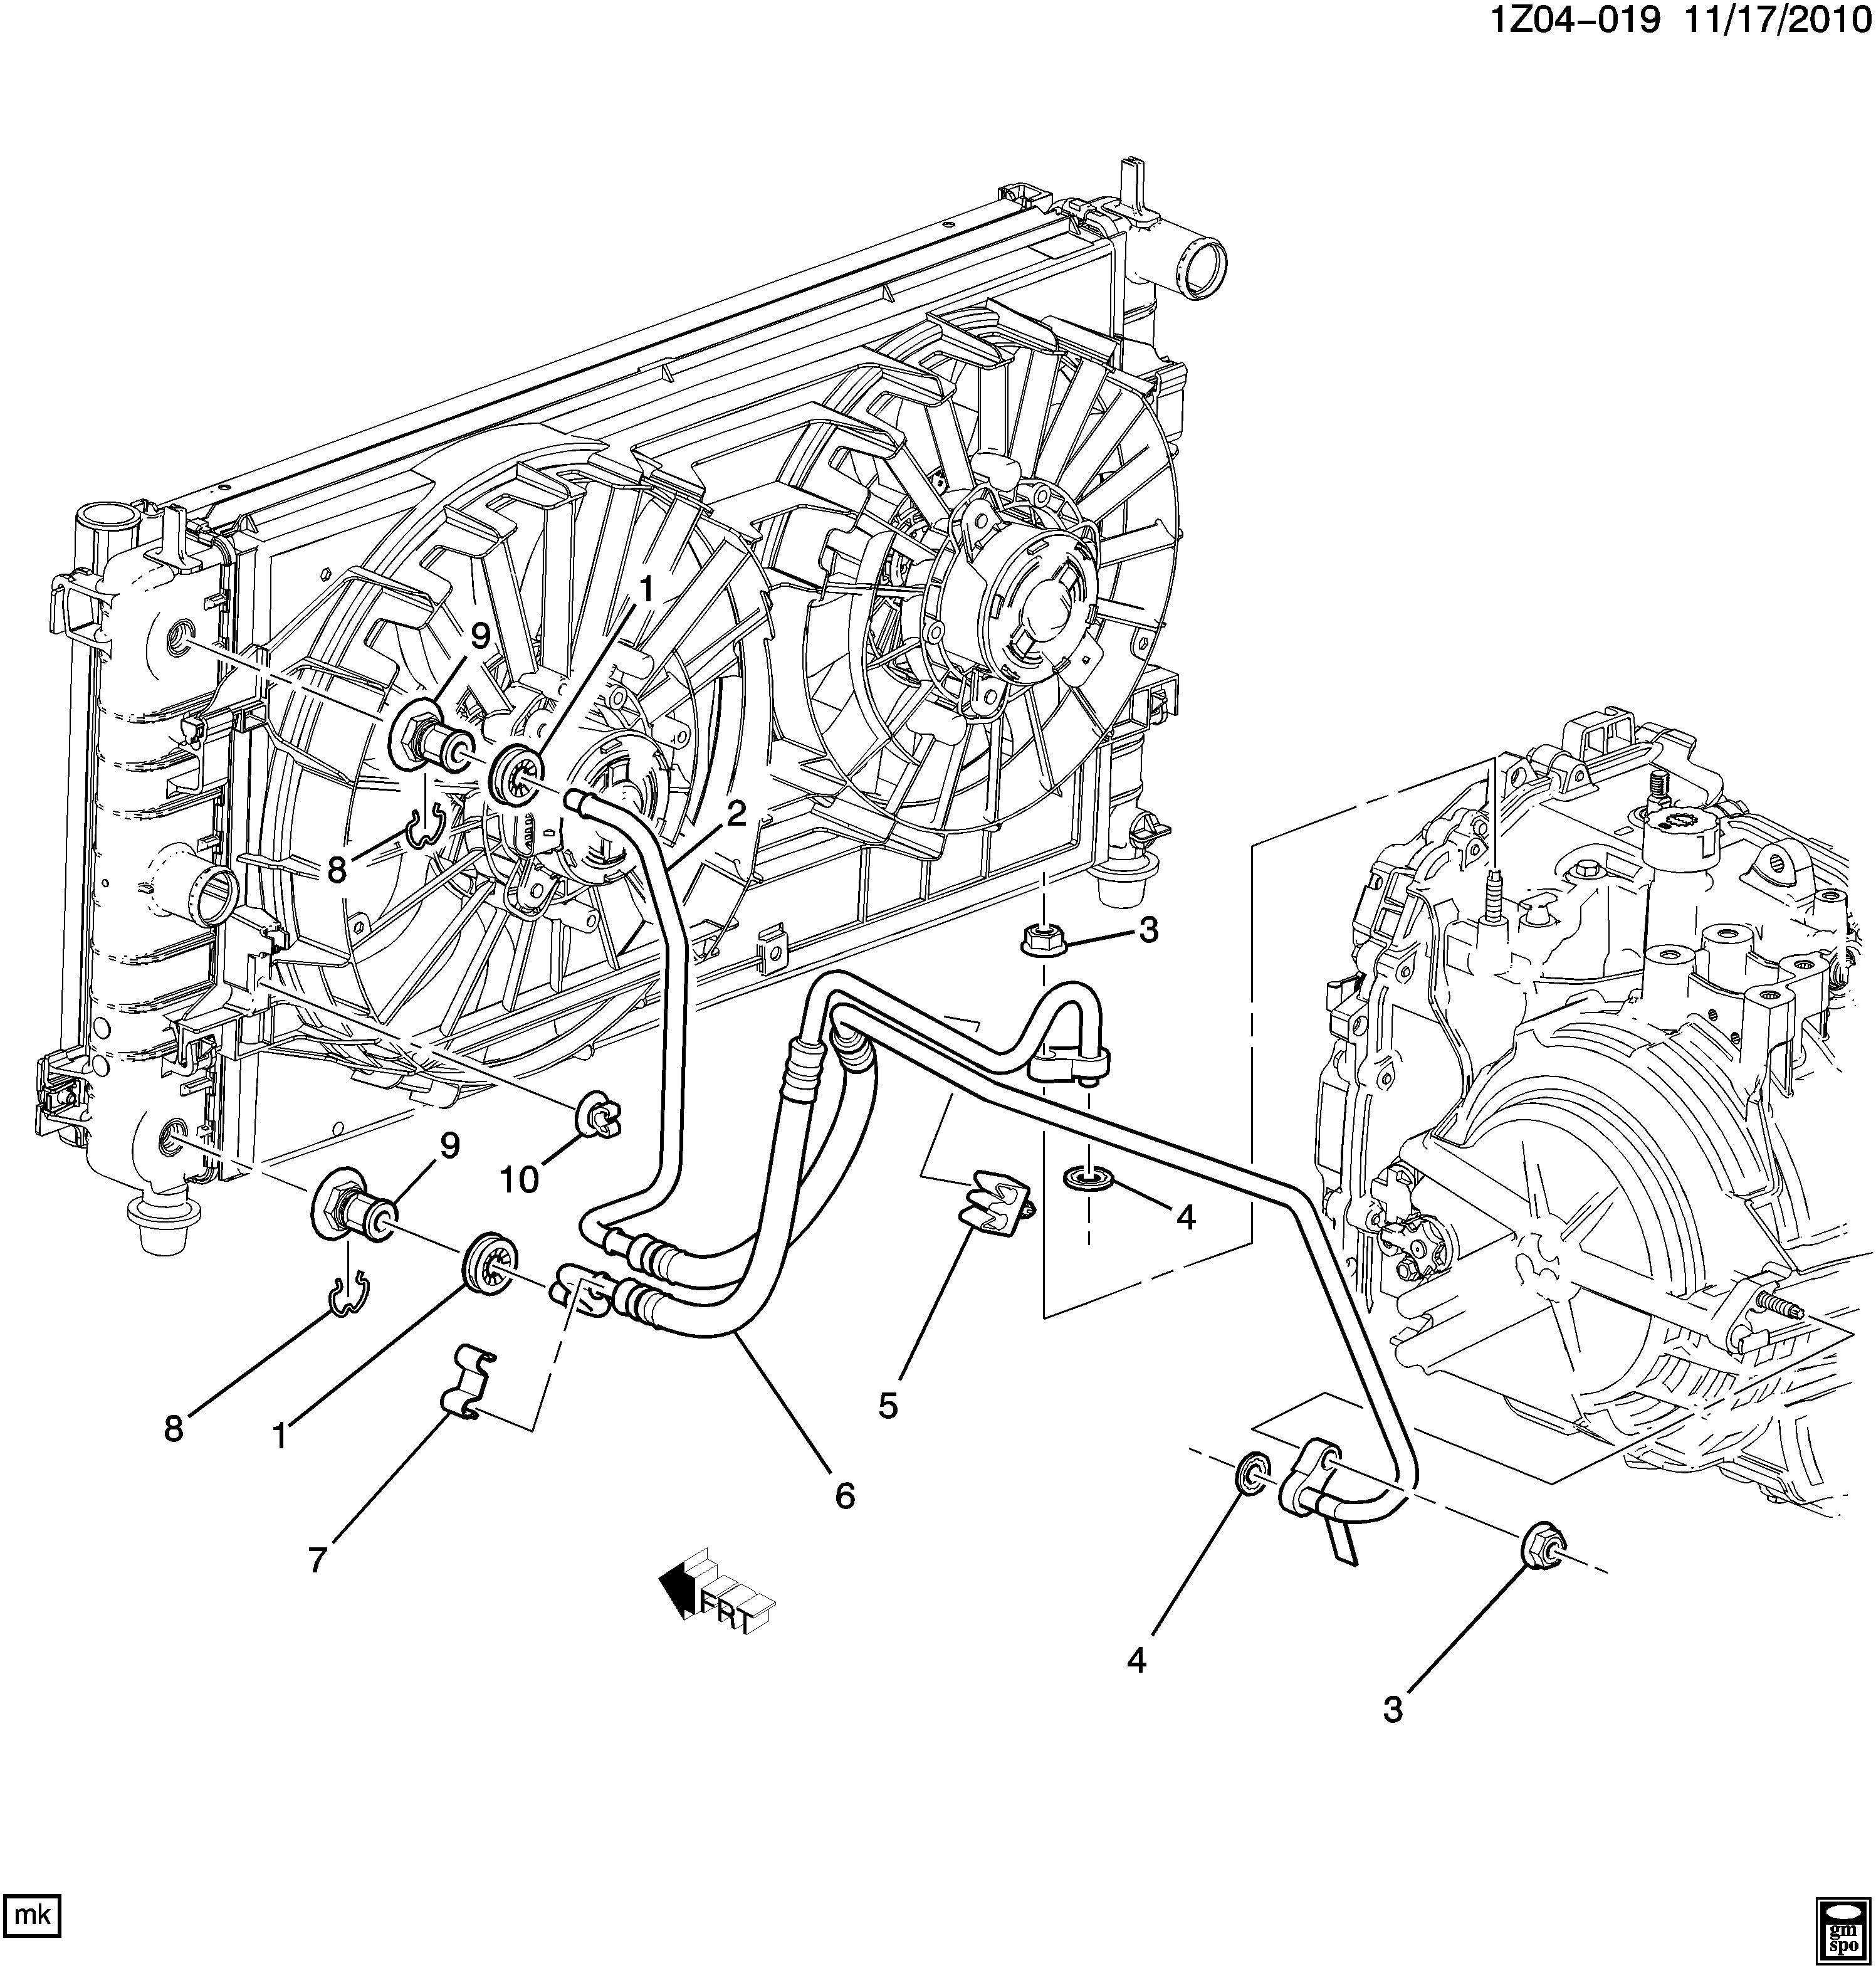 Pontiac G6 Transmission Oil Cooler. CONNECTOR. FITTING